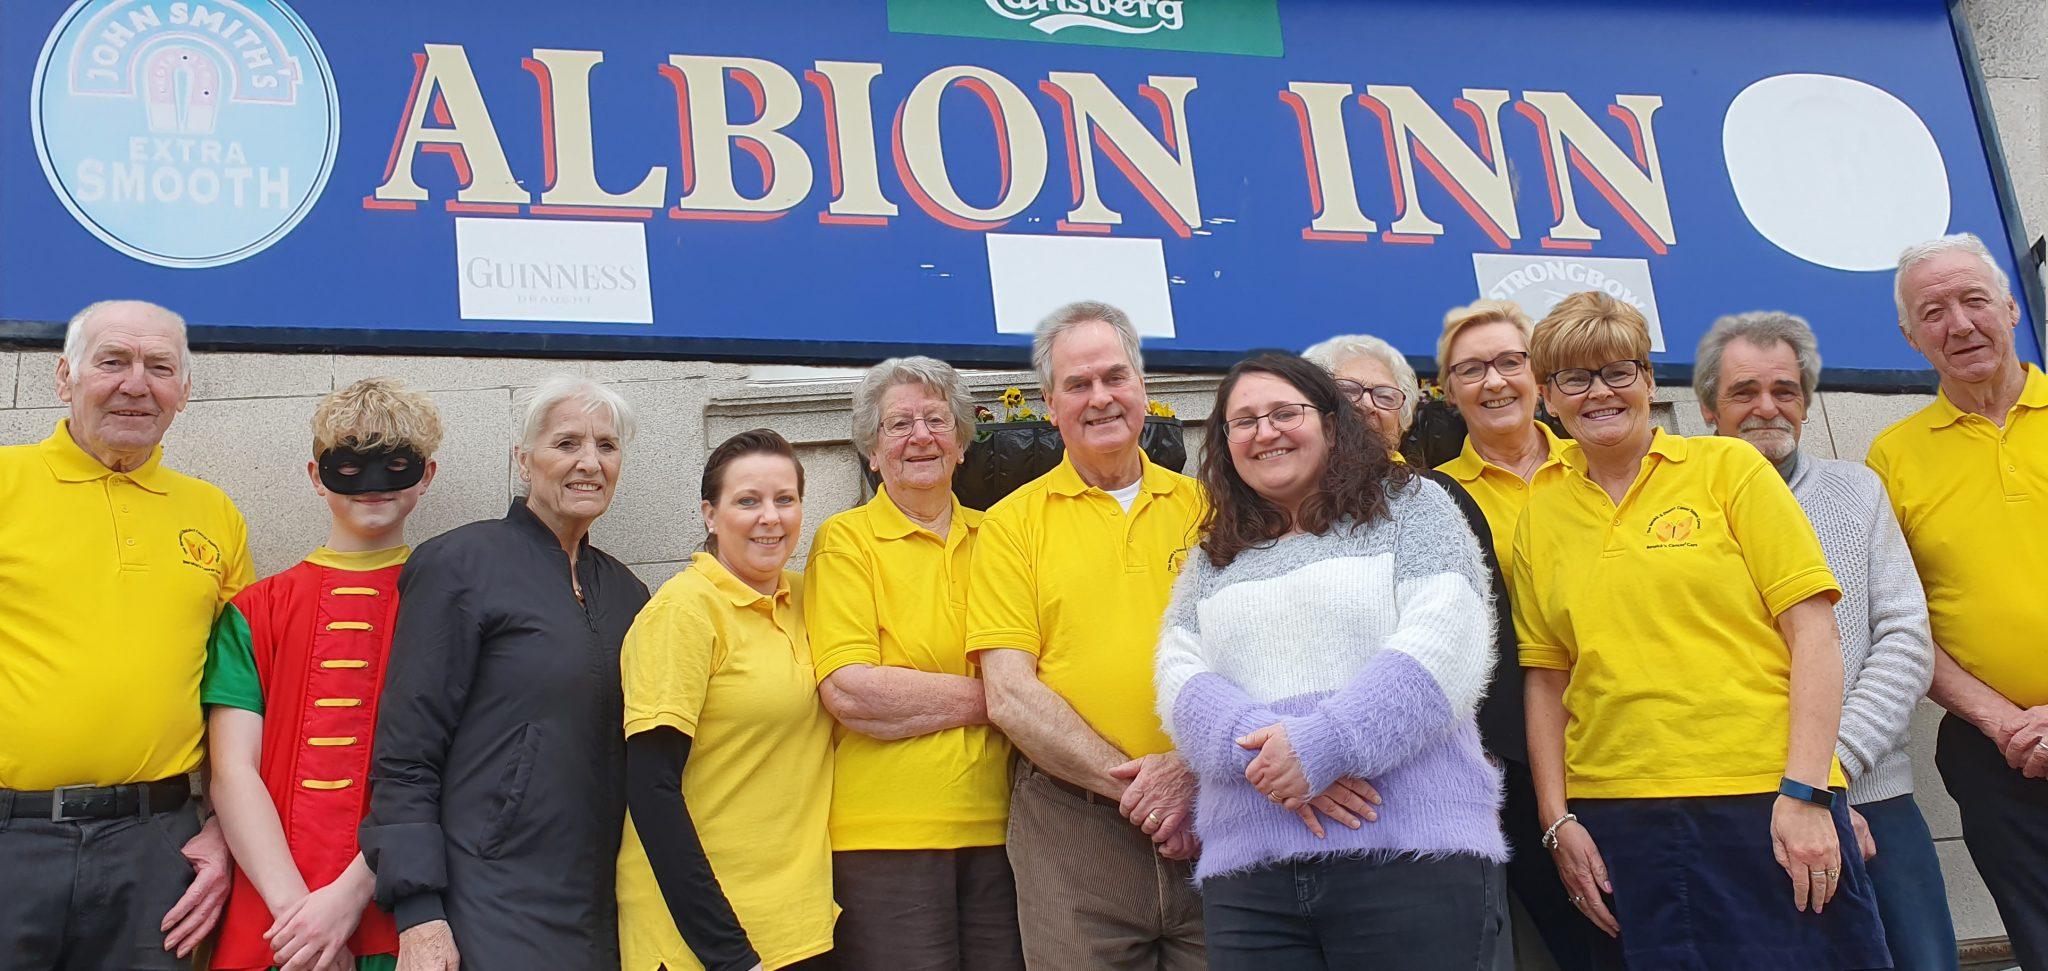 The Albion Inn Spittal - Quiz and Karaoke Fundraiser